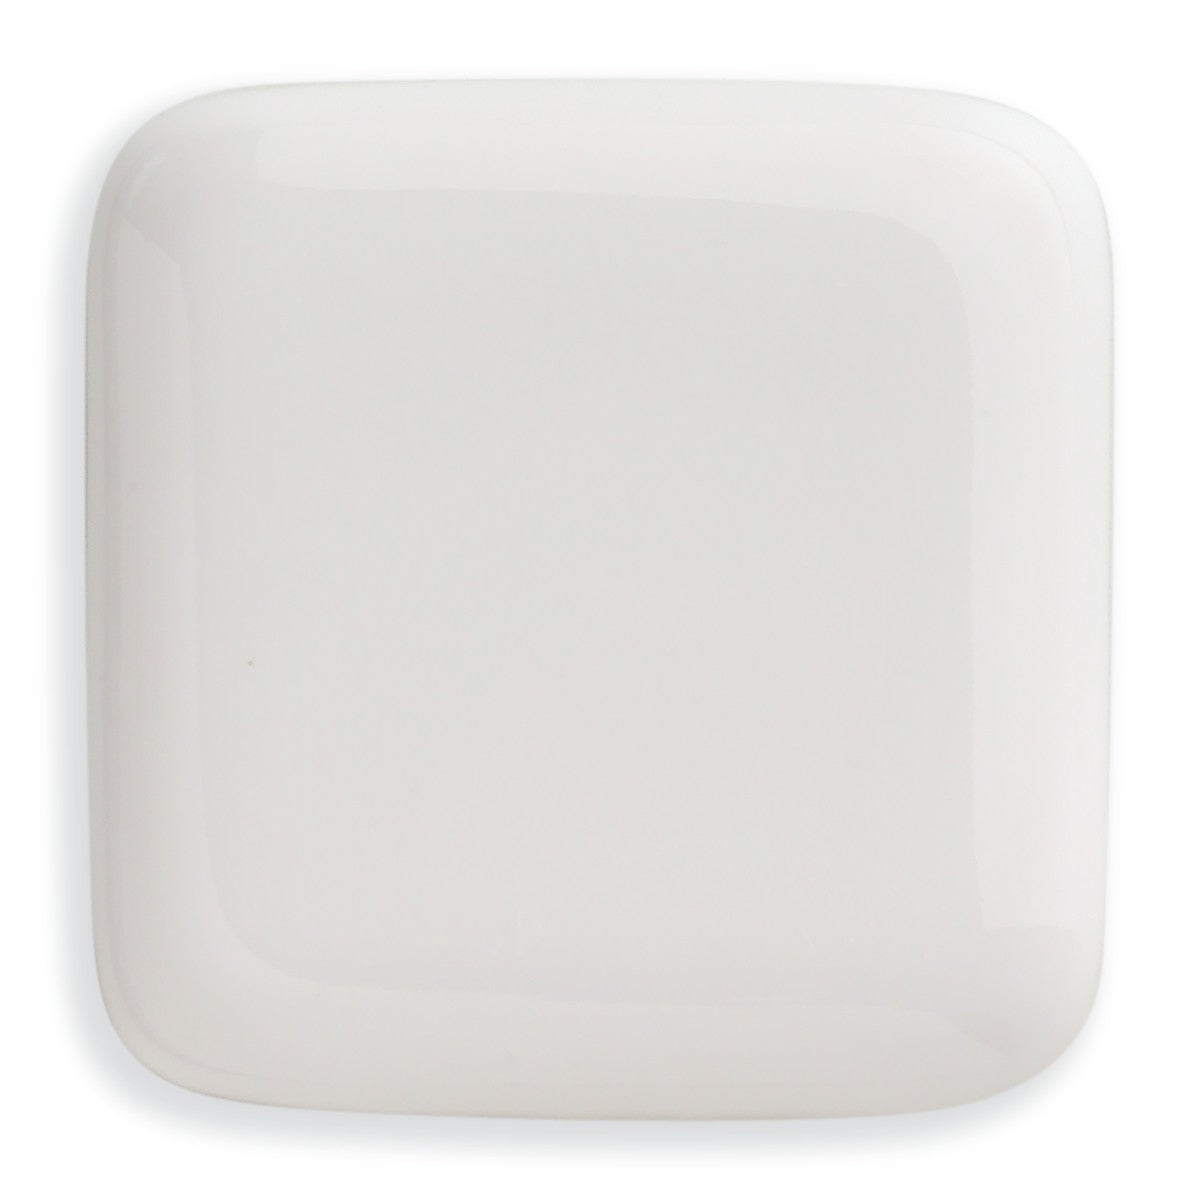 Toto Soiree Soaking Bathtub ABY964N#01N Cotton White (Cot...